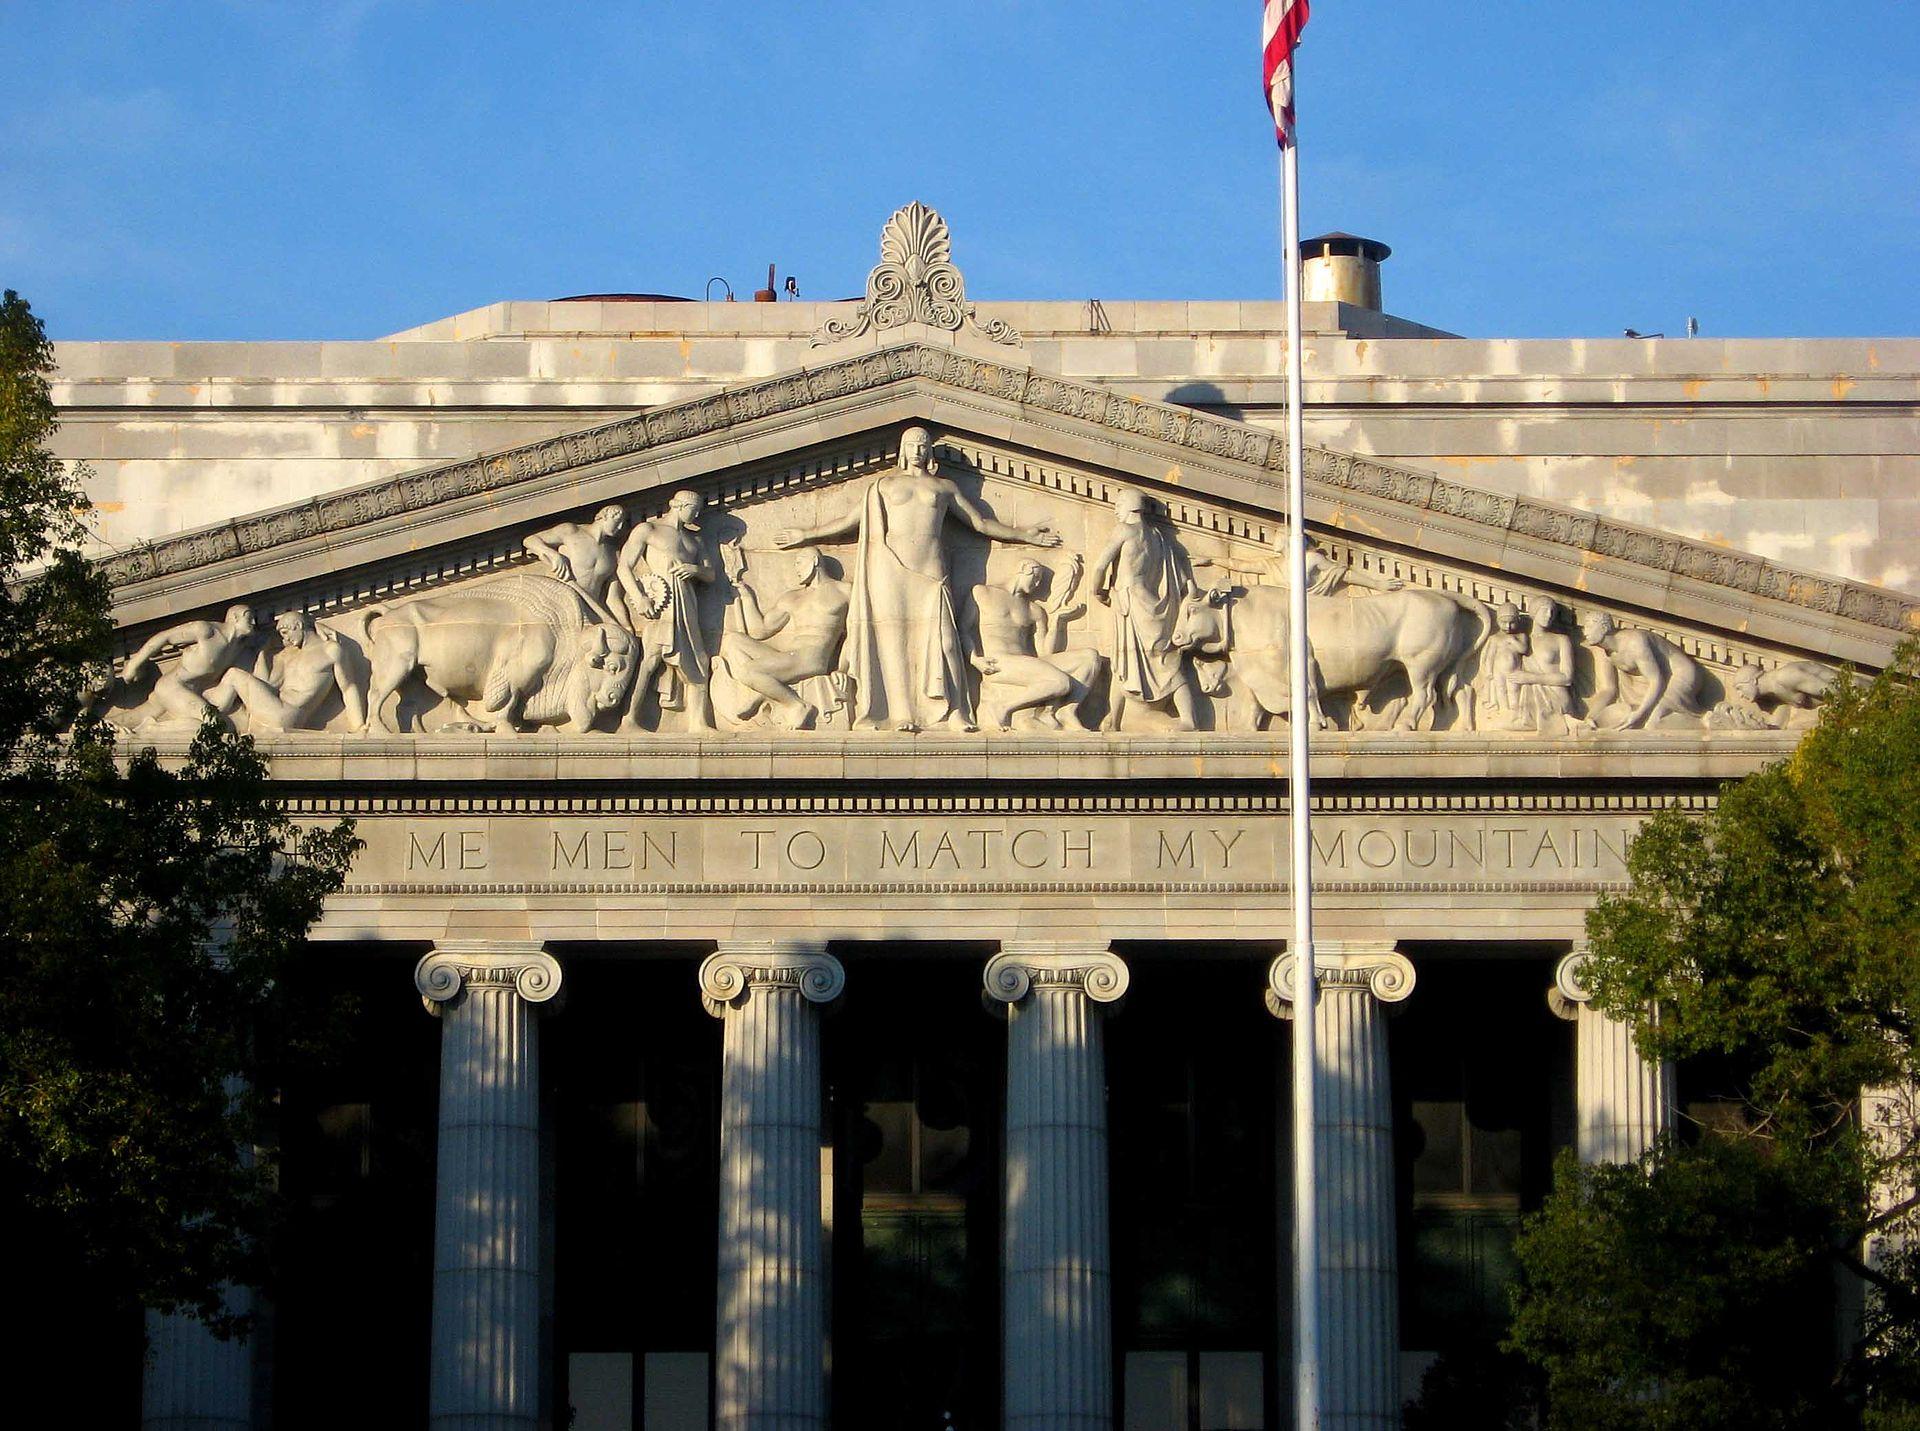 Architectural sculpture wikipedia